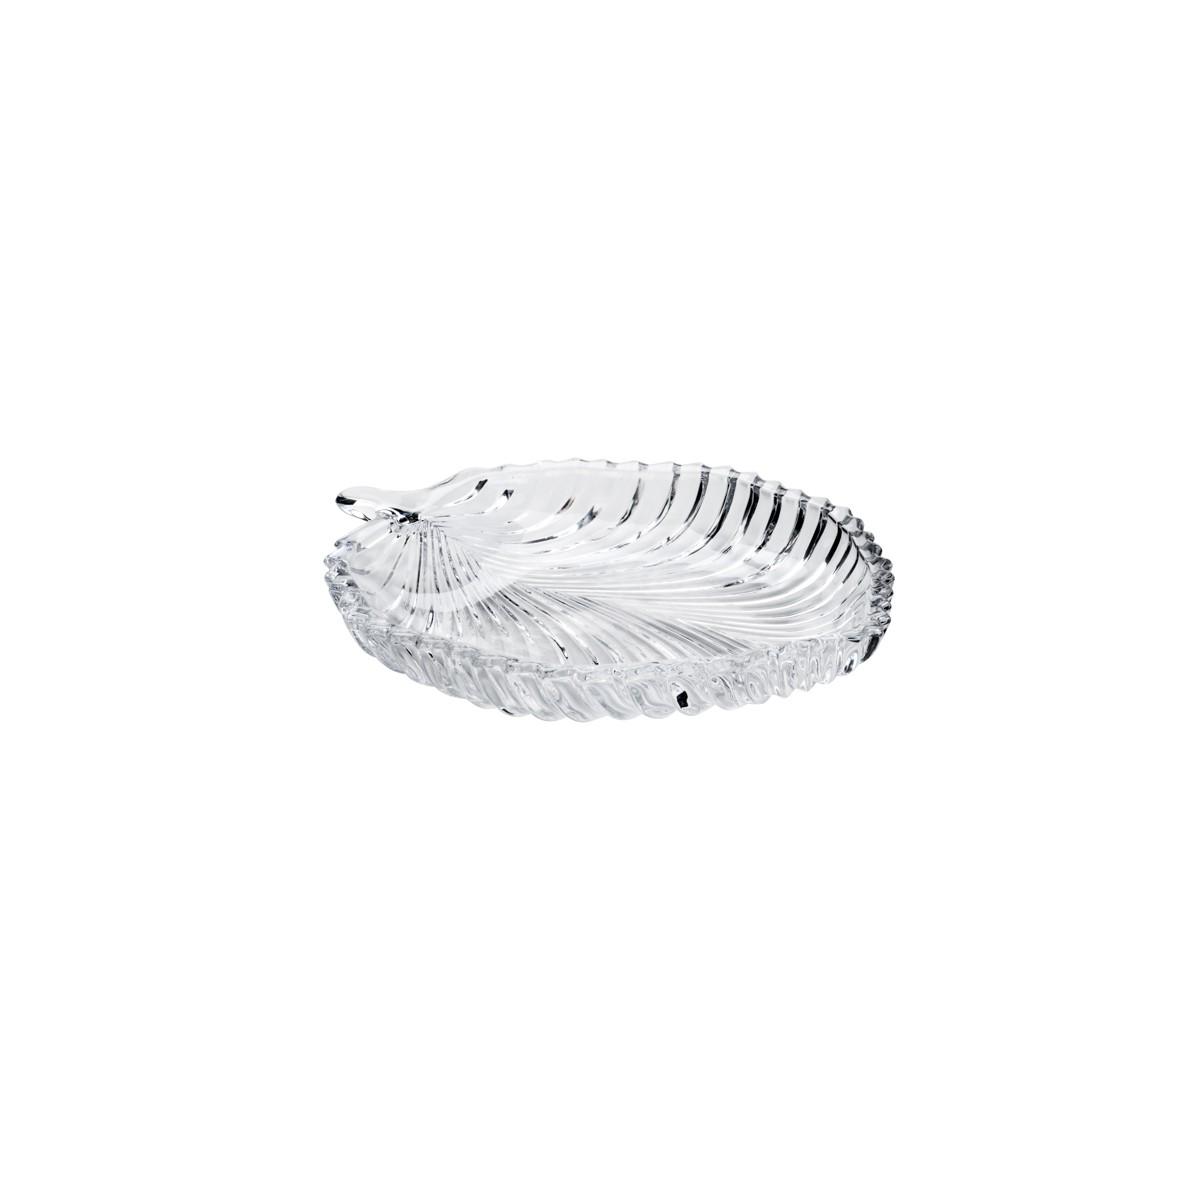 Kit com 2 pratos  20,5 x 17 x 2,5 cm -  Cristal de chumbo